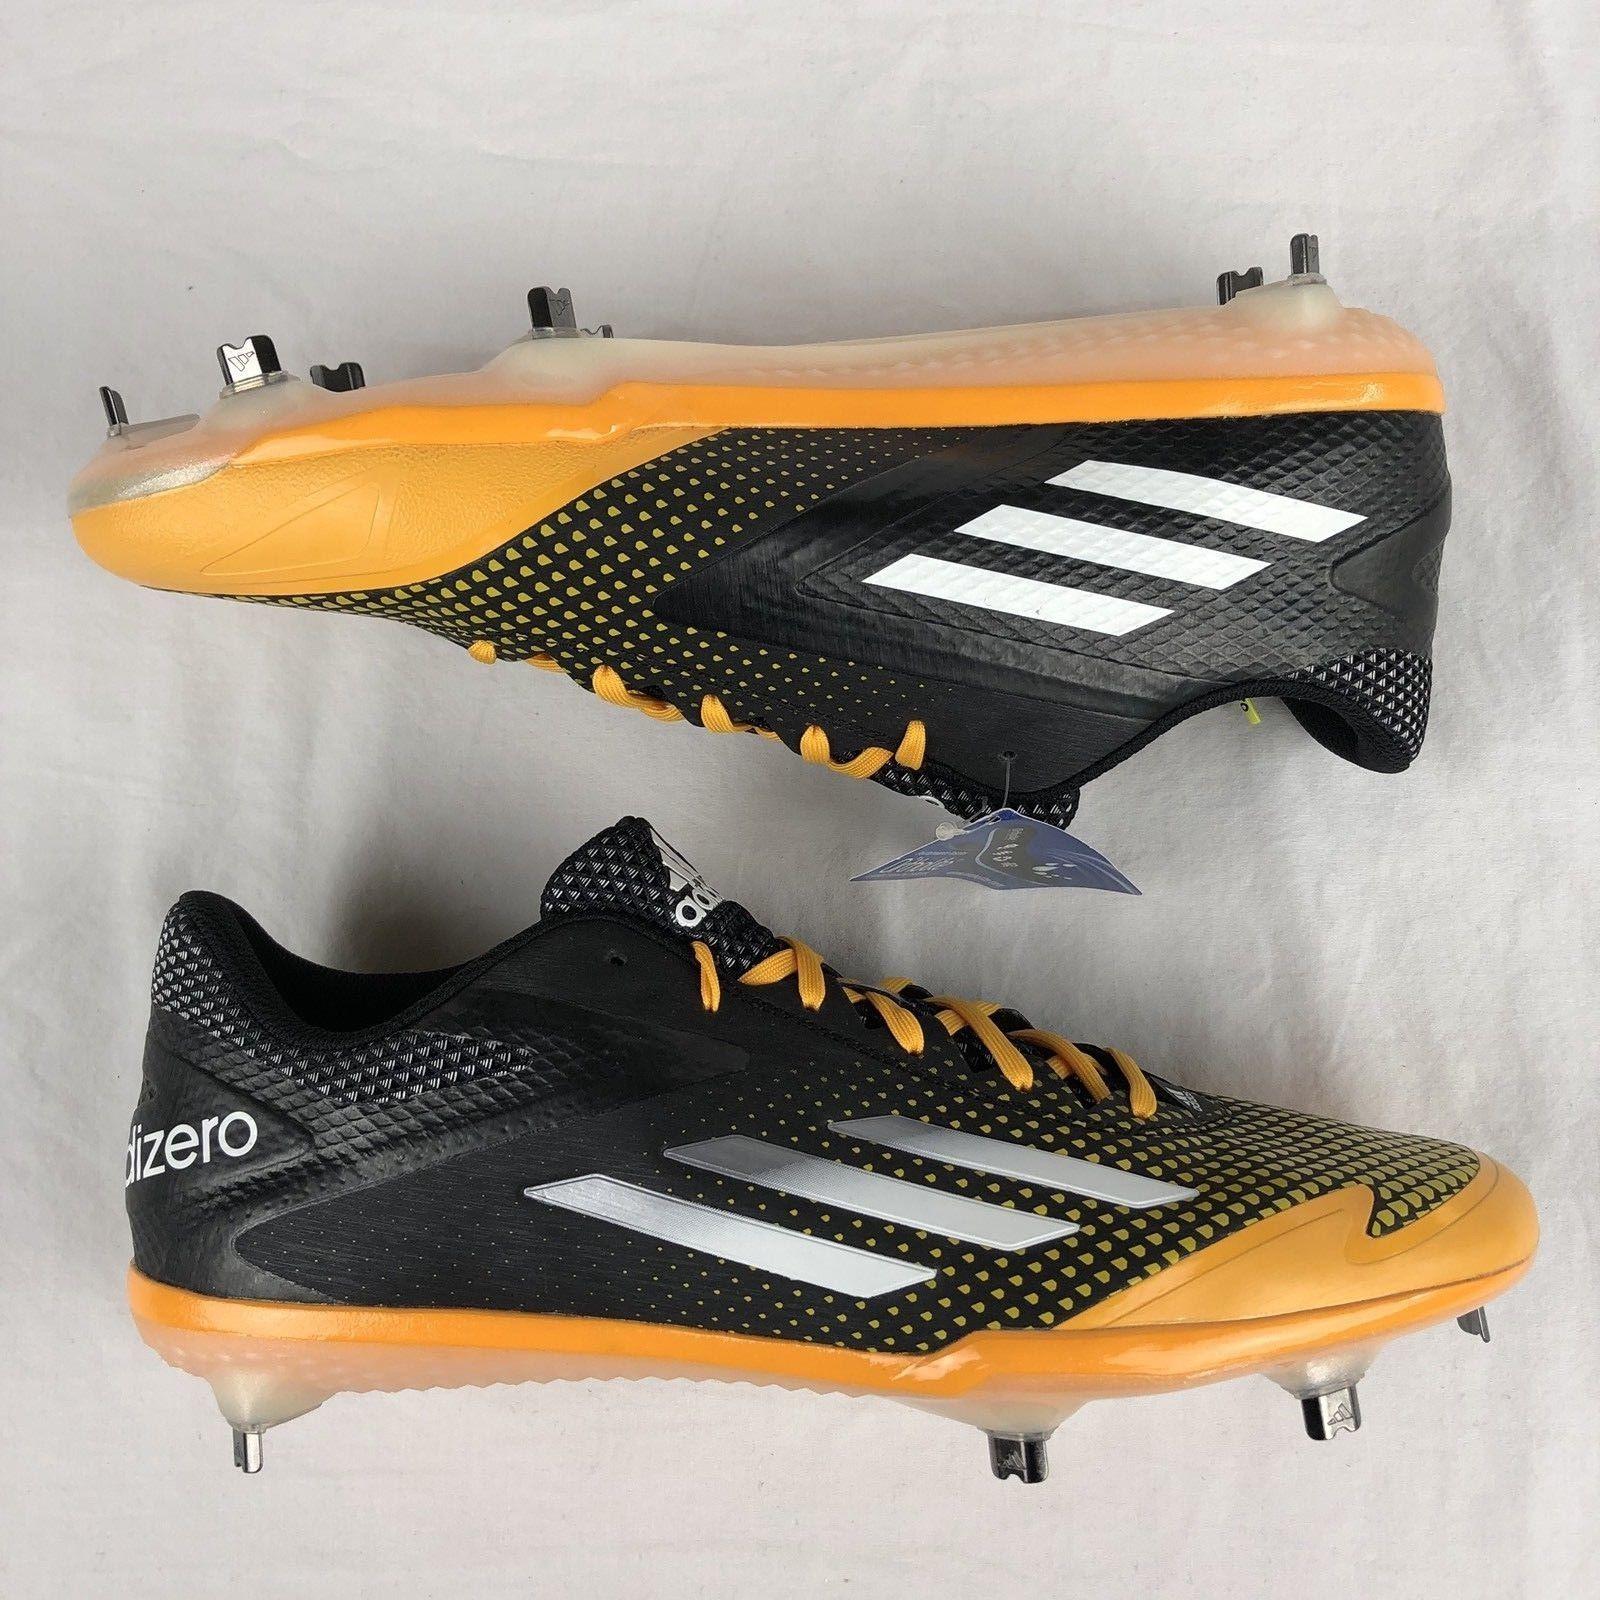 6ed4e22113e1b5 Adidas Men s Adizero Afterburner 2.0 and 50 similar items